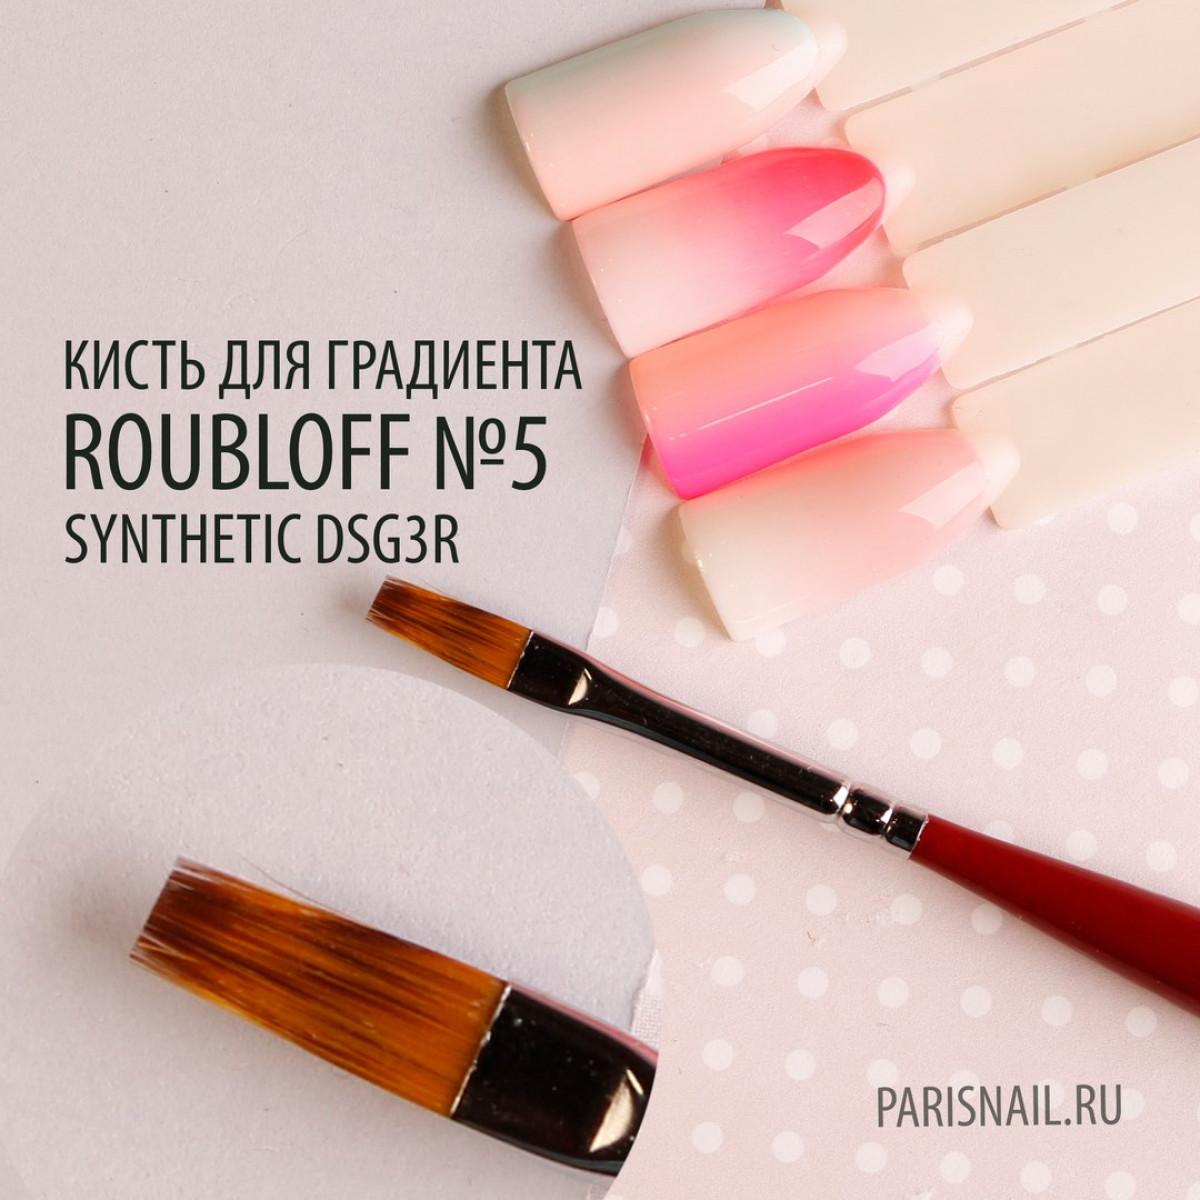 Кисть для градиента-гребешок синтетика,имитация колонка № 5 серия DSG3R Roubloff